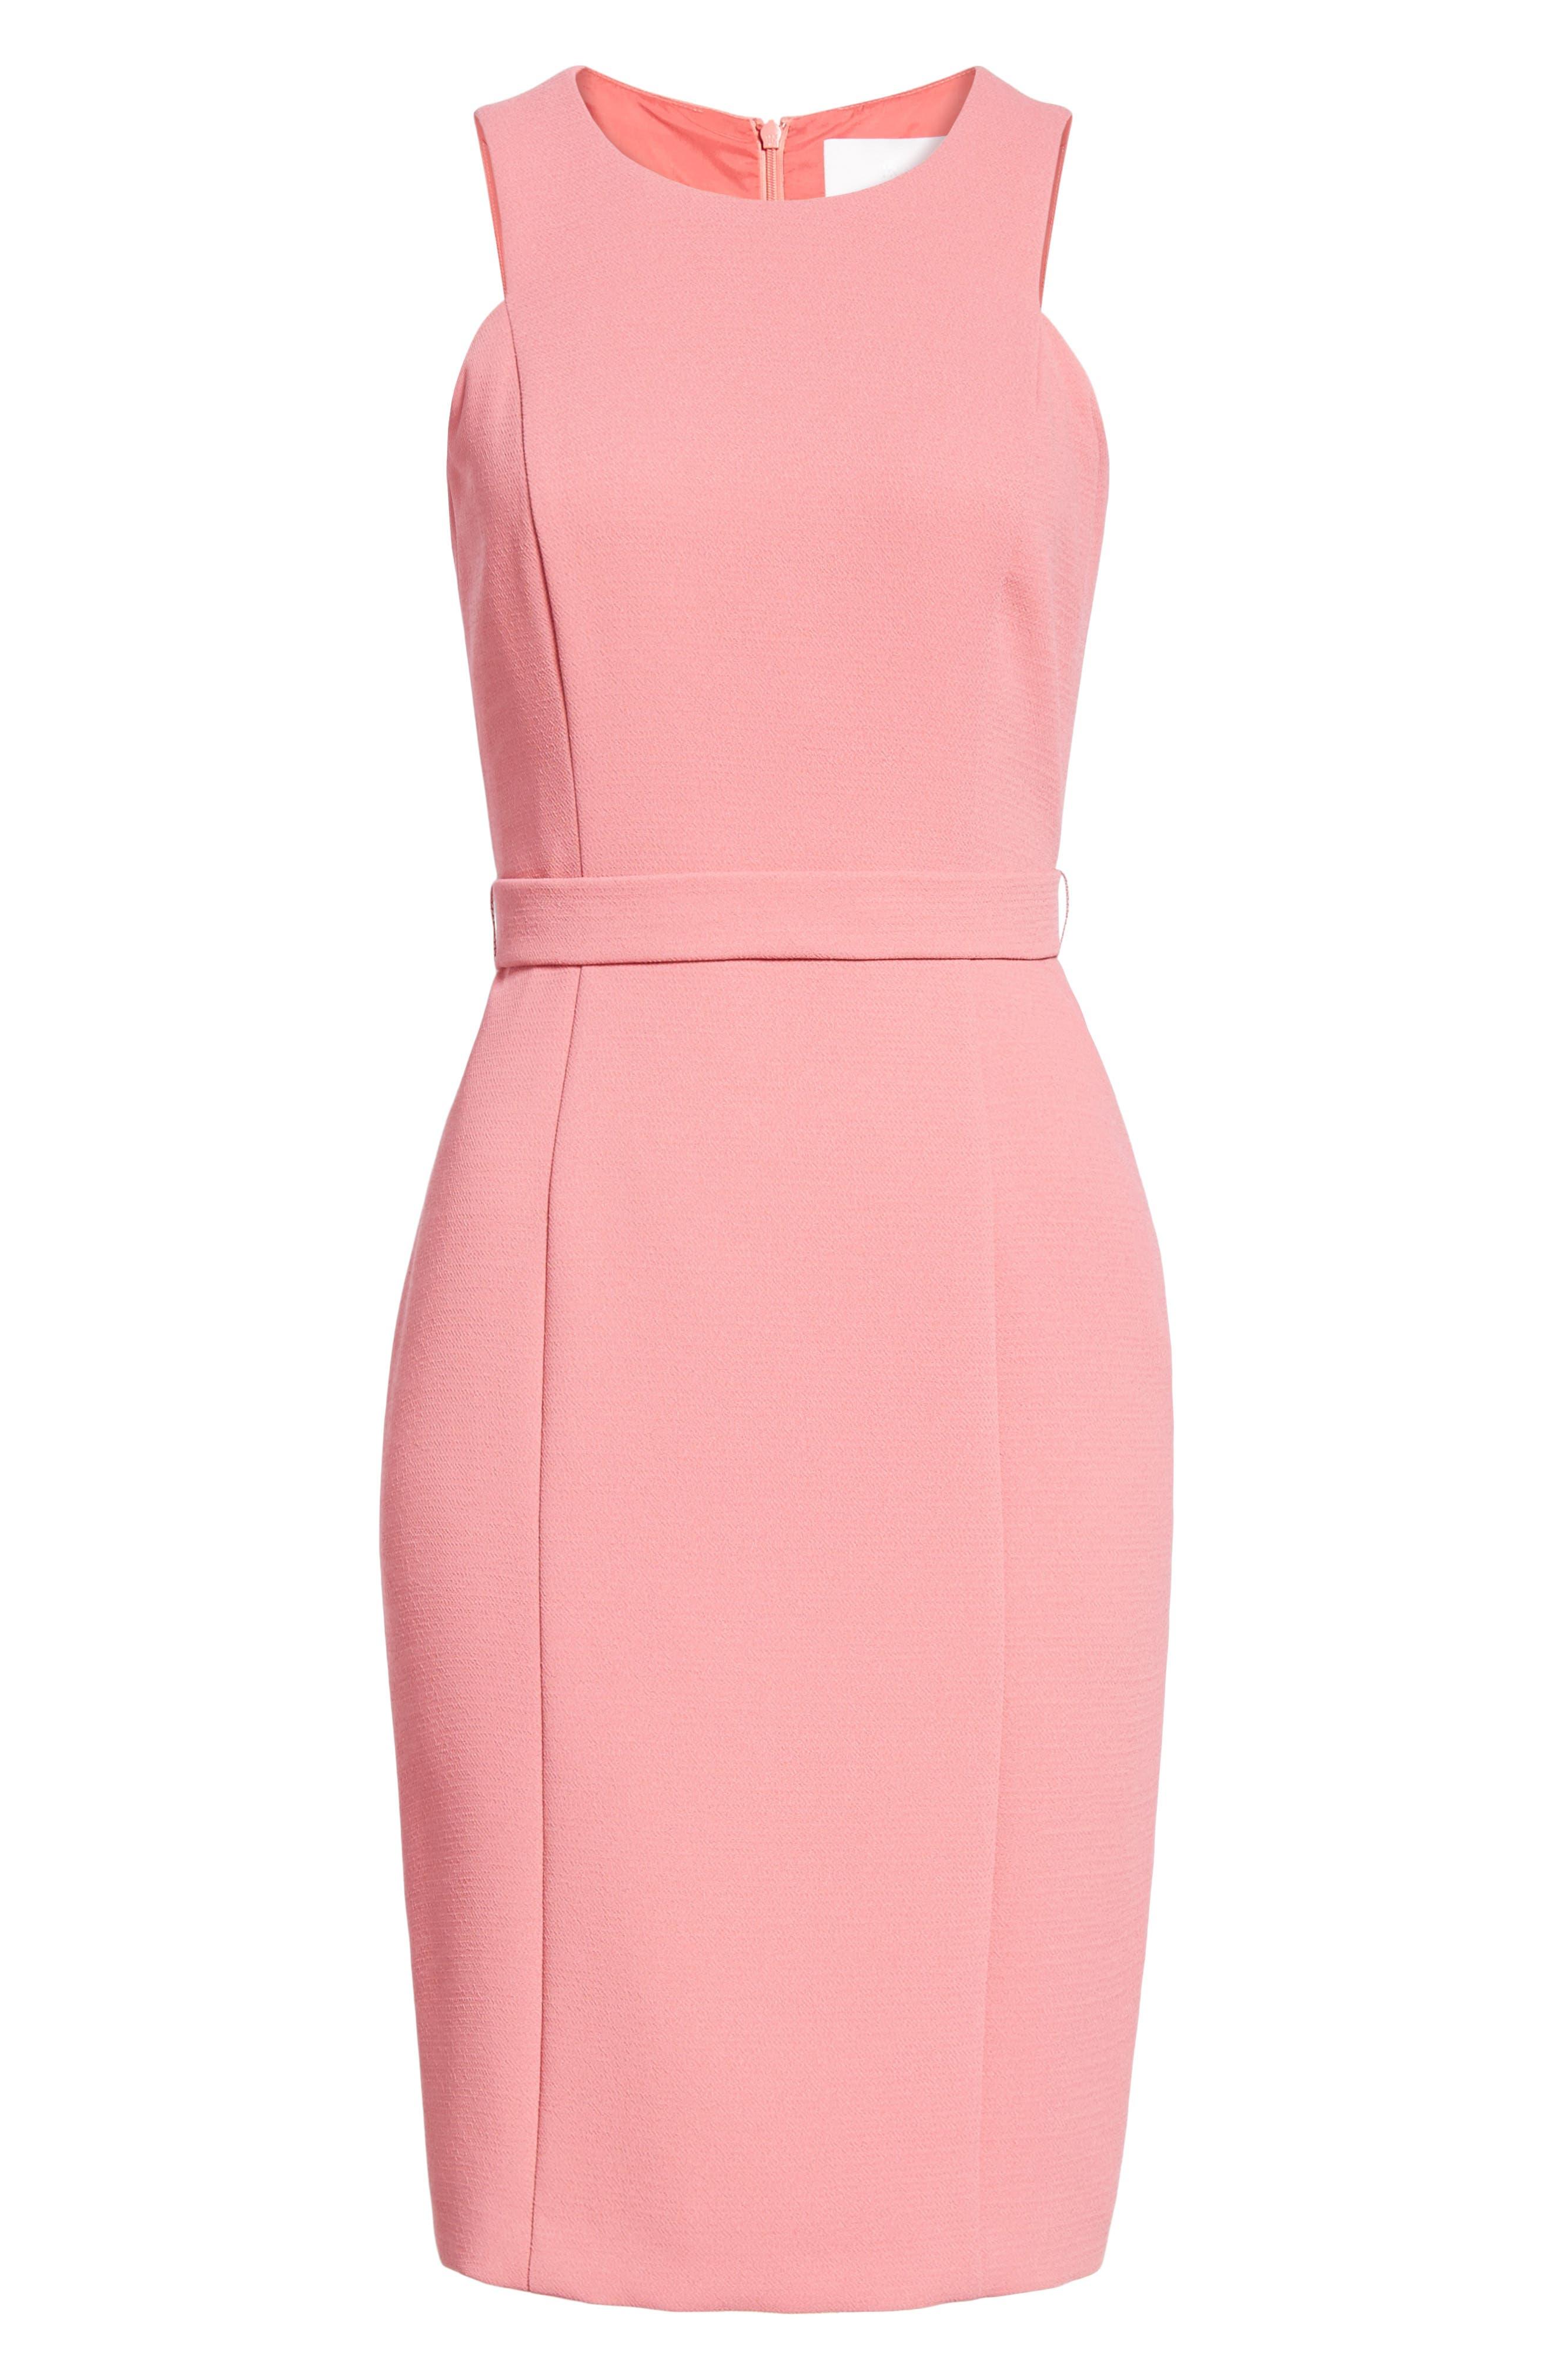 Dalanea Belted Sheath Dress,                             Alternate thumbnail 6, color,